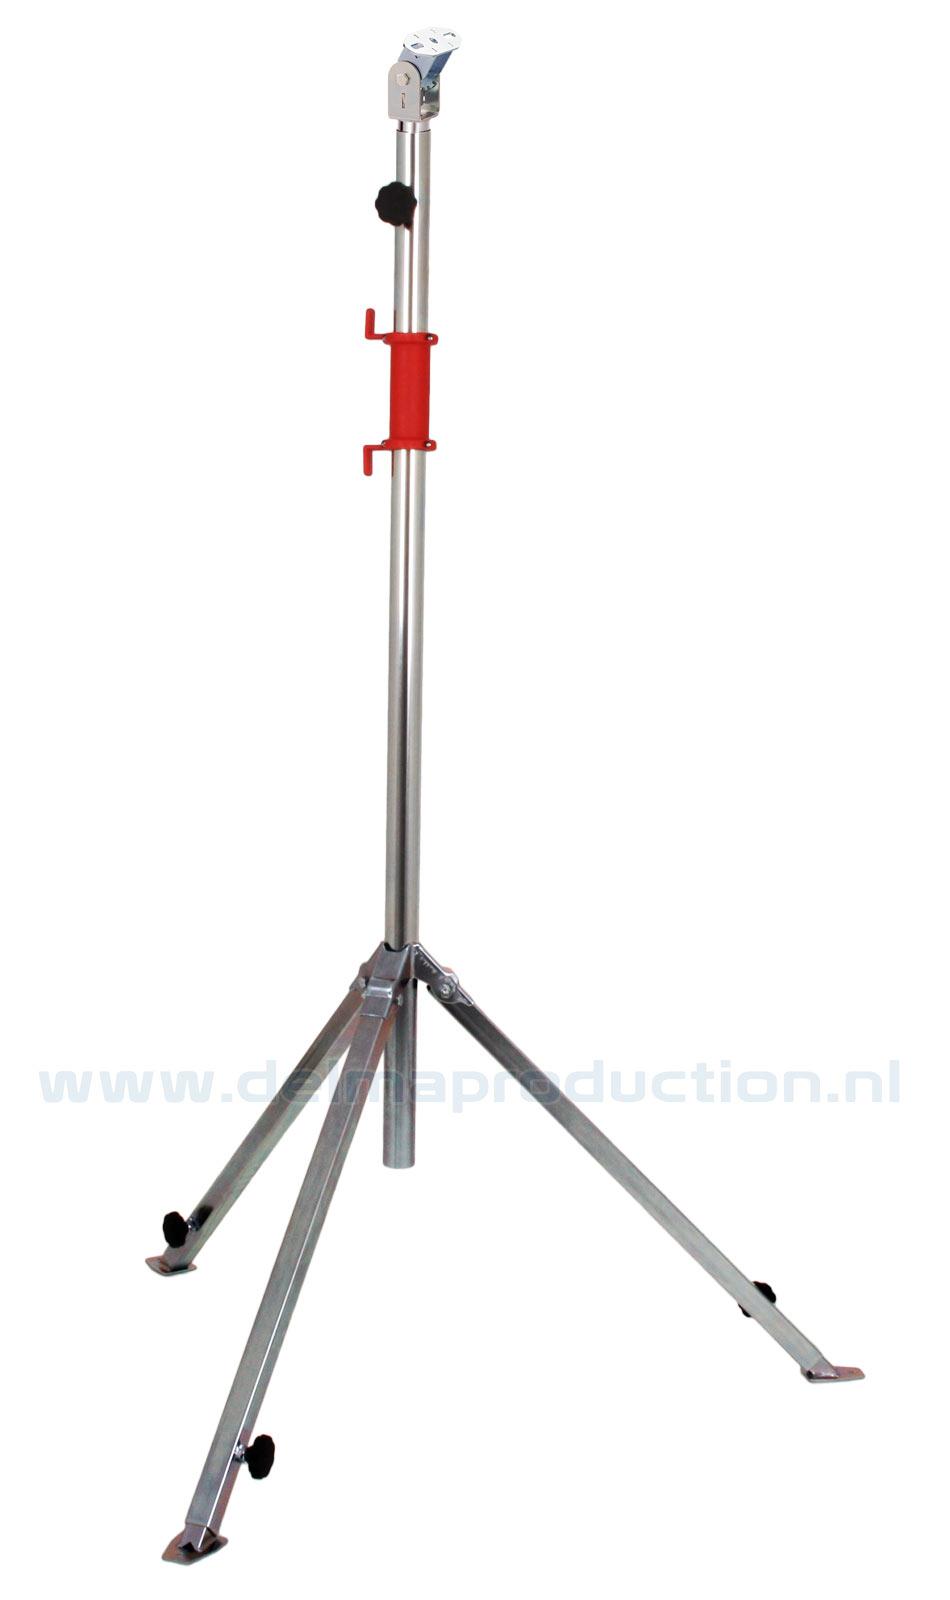 Tripod worklight stand 2-part, adjustable undercarriage, quick adjustment